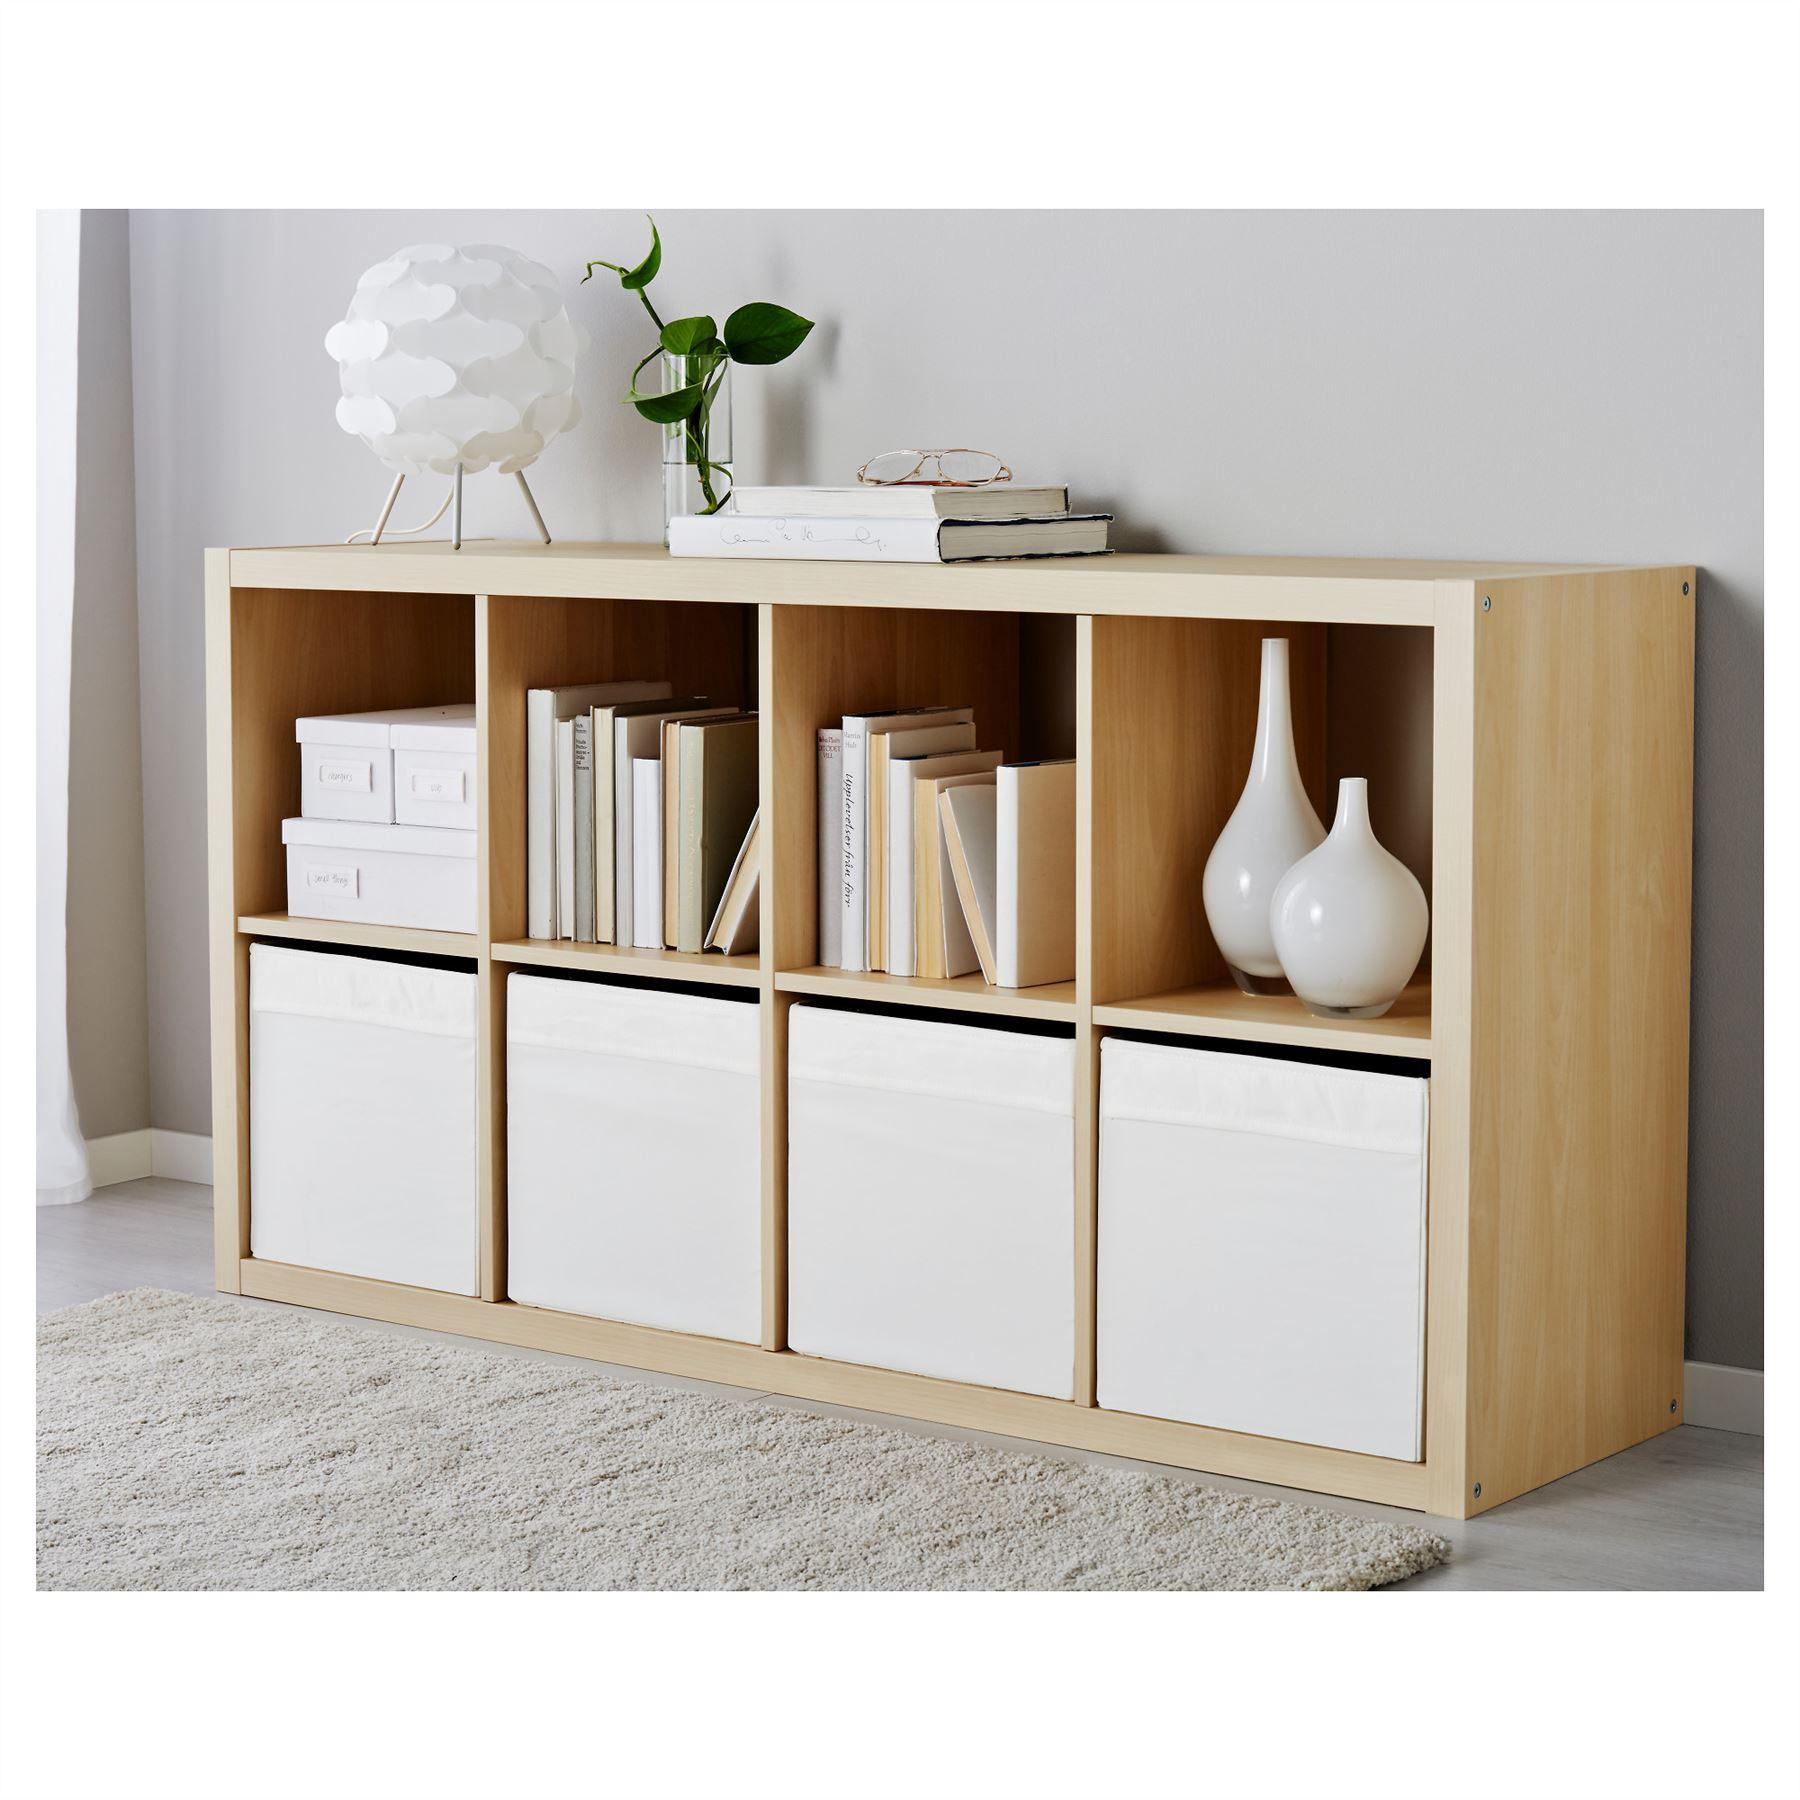 ikea drona box fabric storage kallax shelving magazine toys books white x3 ebay. Black Bedroom Furniture Sets. Home Design Ideas